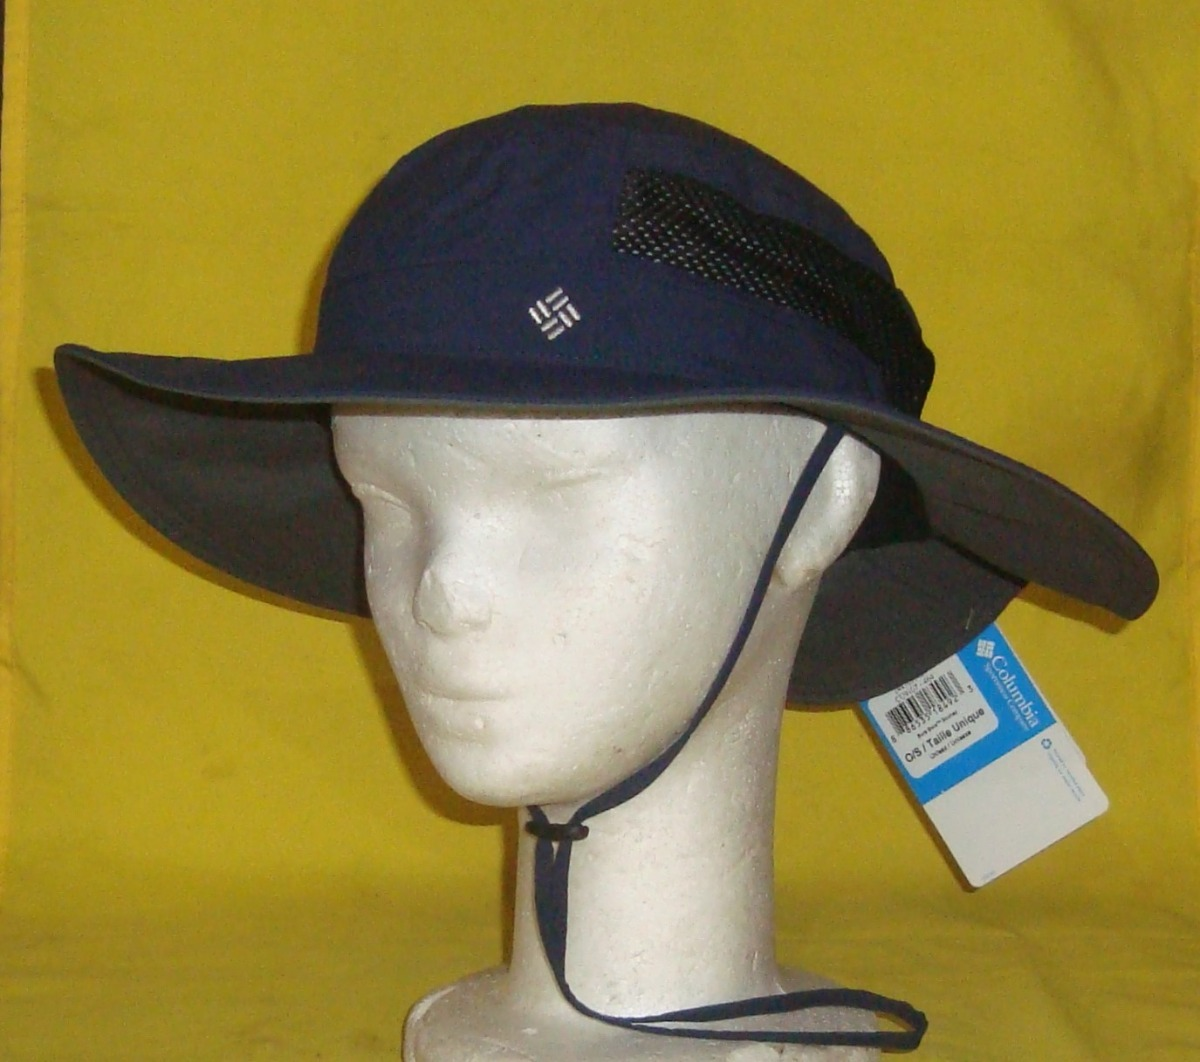 57cbf73866c32 sombrero columbia bora bora booney azul marino pezca caza. Cargando zoom.